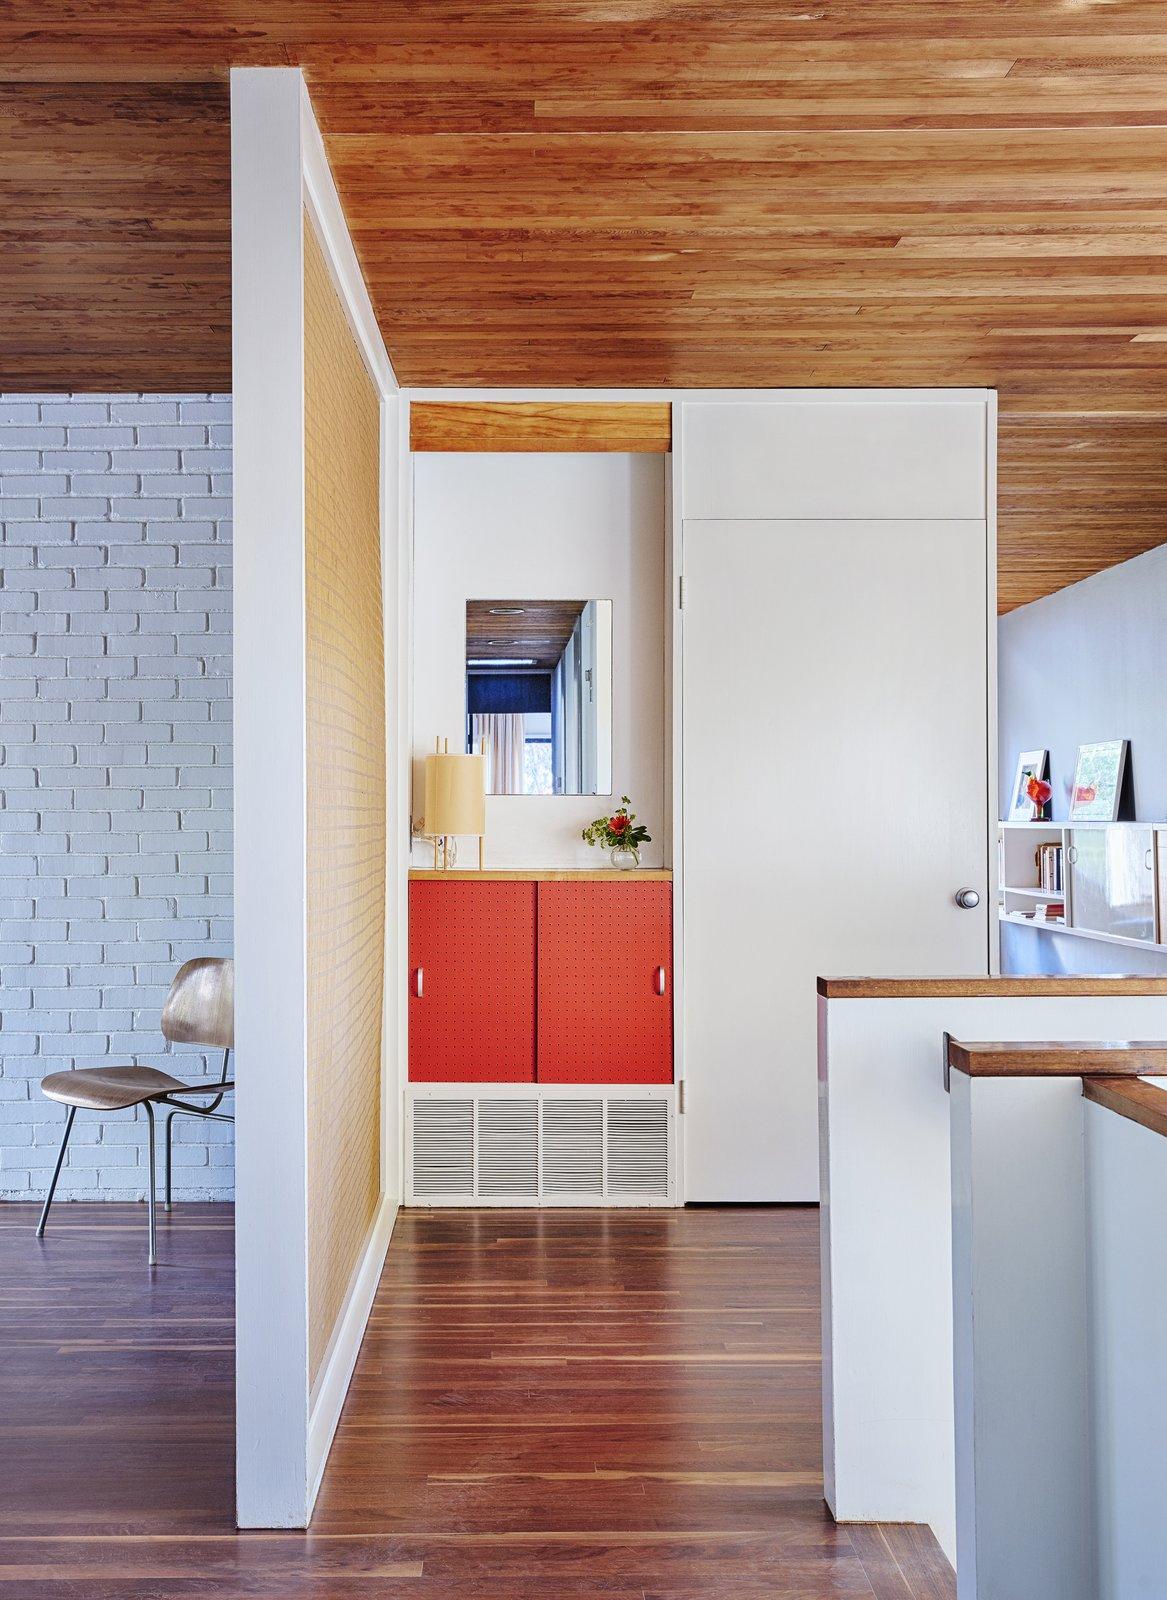 Snower Restoration in Kansas City, Missouri Tagged: Hallway and Dark Hardwood Floor.  Photo 3 of 11 in Dwell's Top 10 Design Pros of 2017 from Snower Restoration